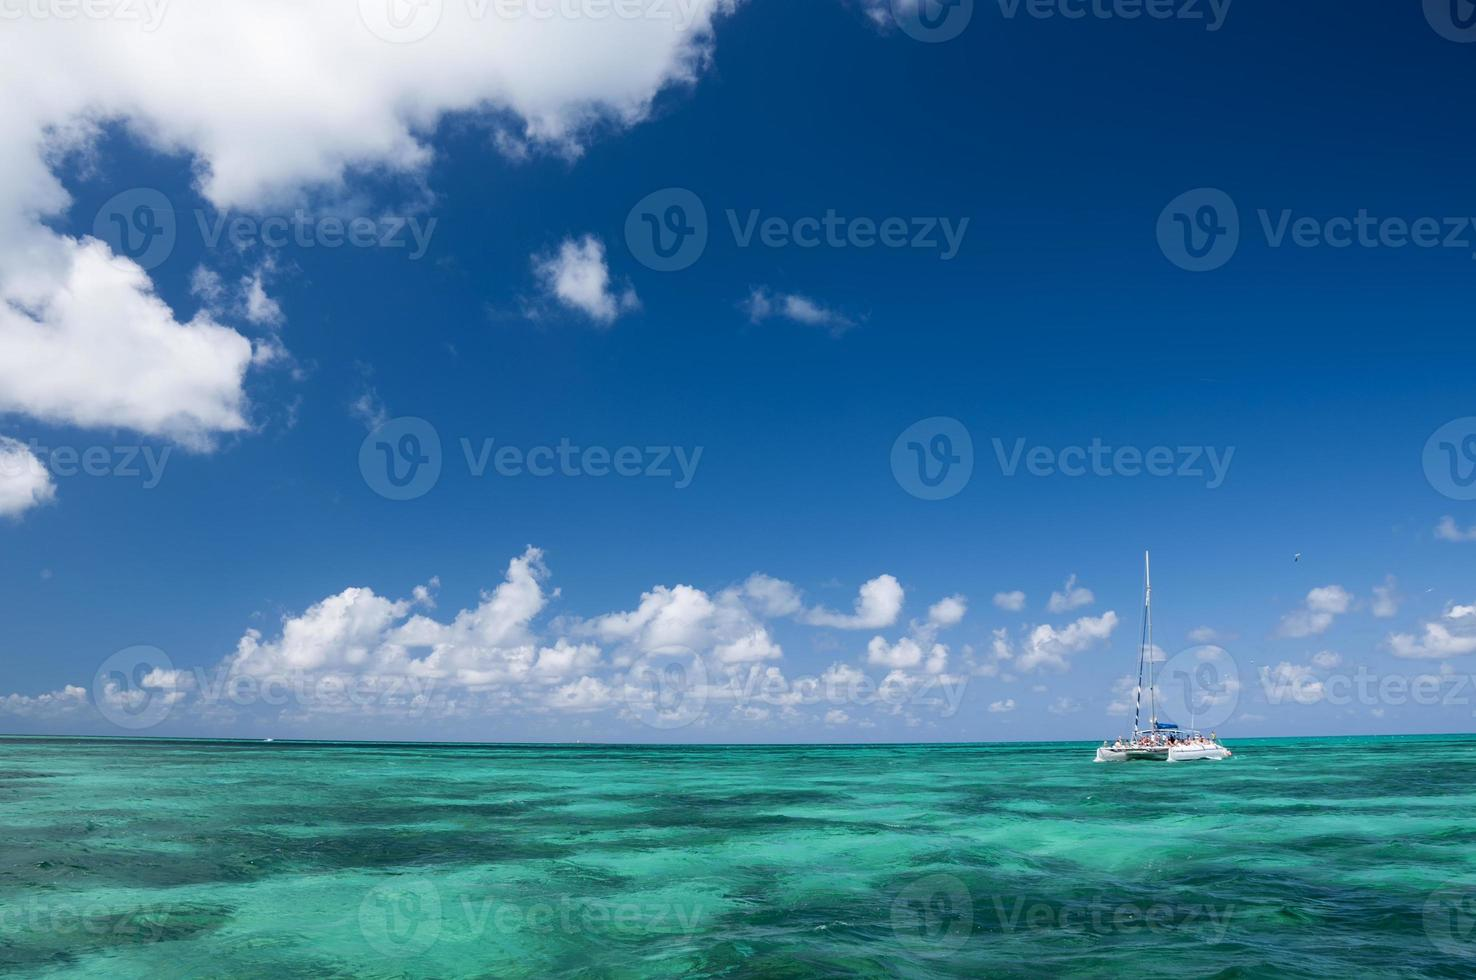 White catamaran with tourists photo